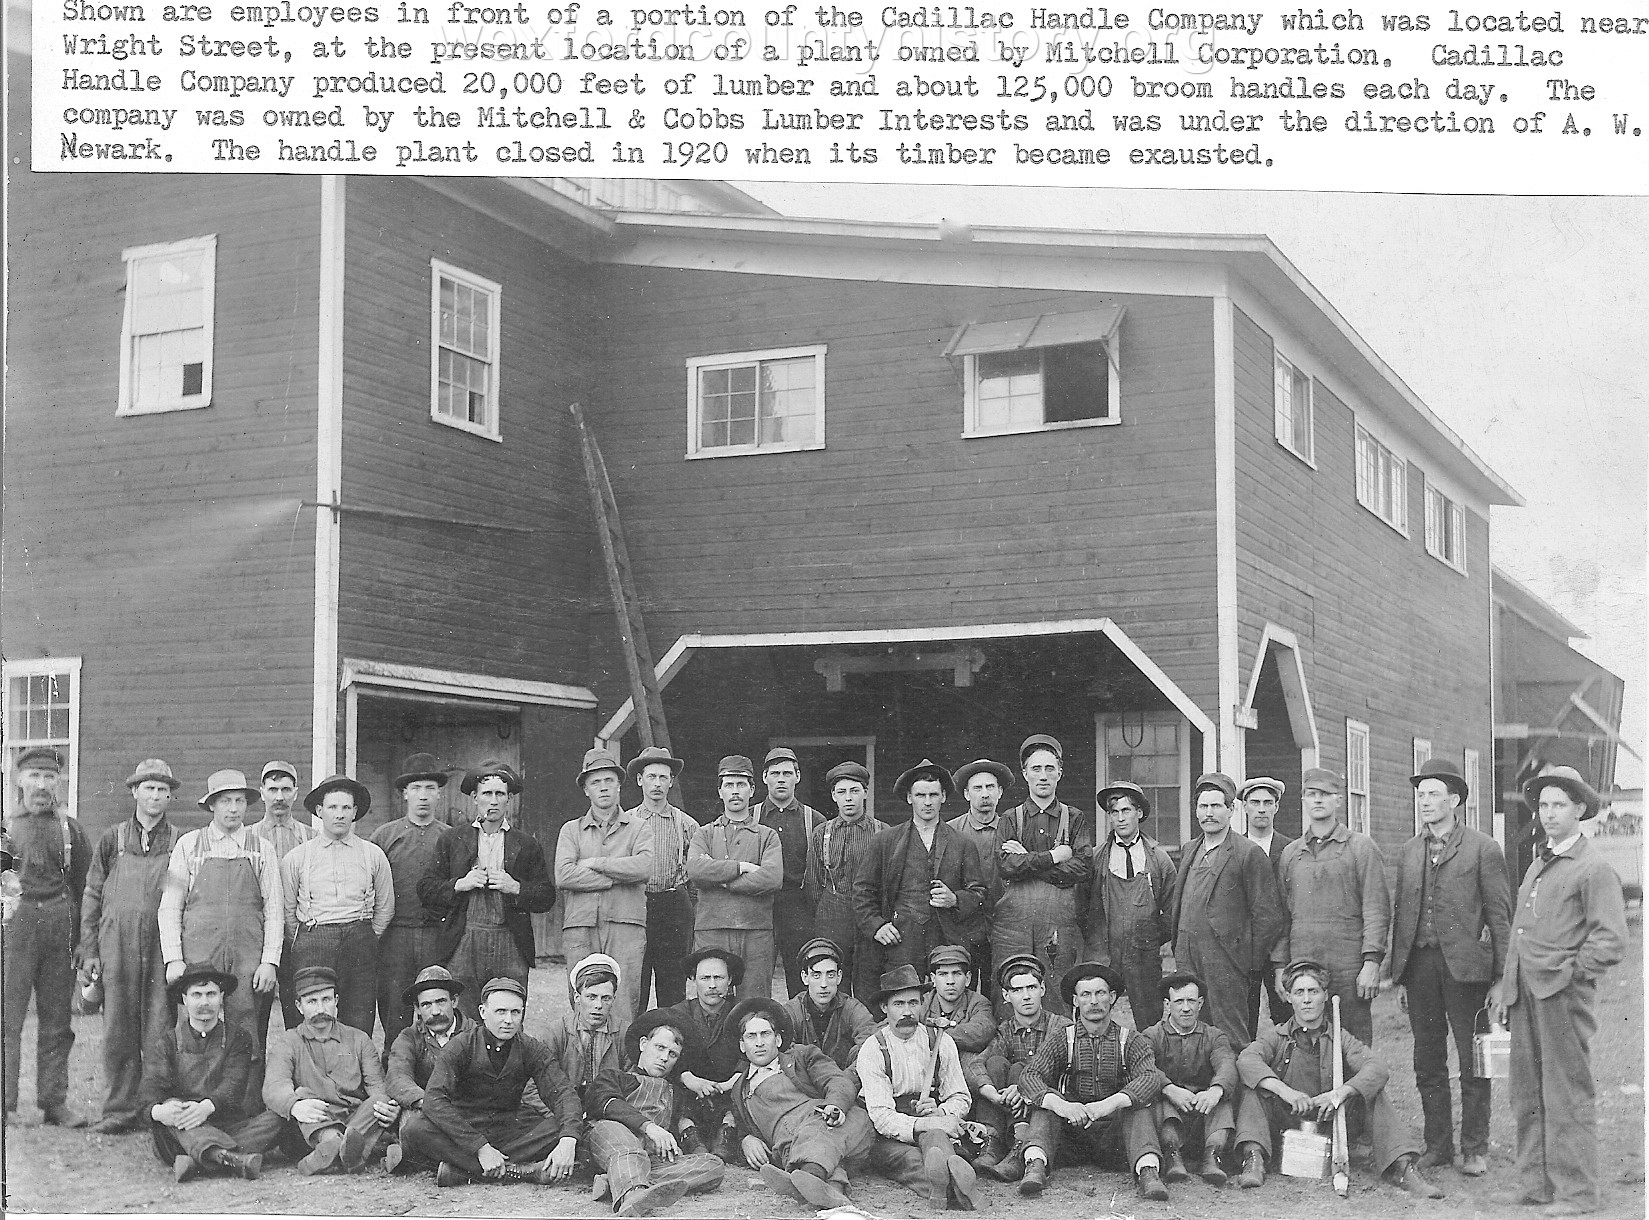 Cadillac Handle Company, 1905